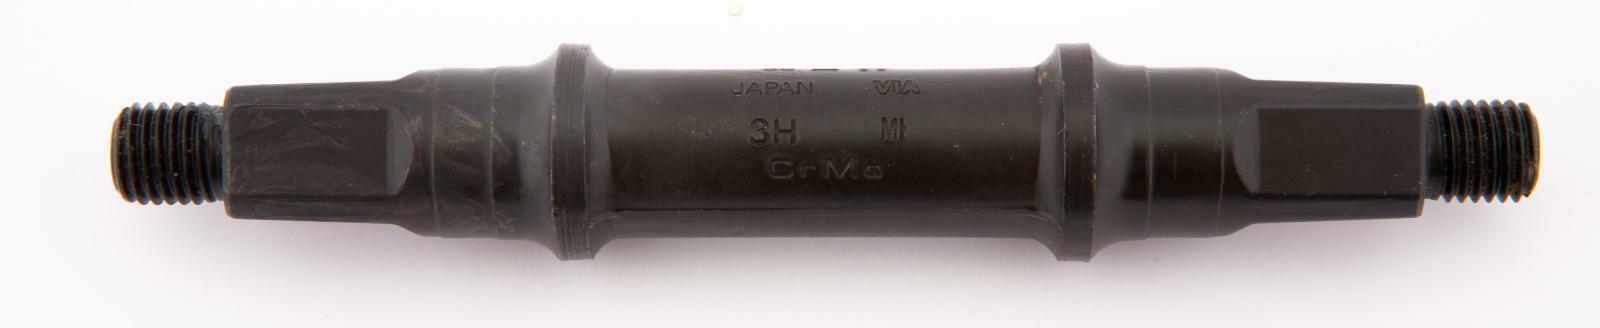 Oxford Bottom Bracket Axle Cotterless 3A 68//117.5mm